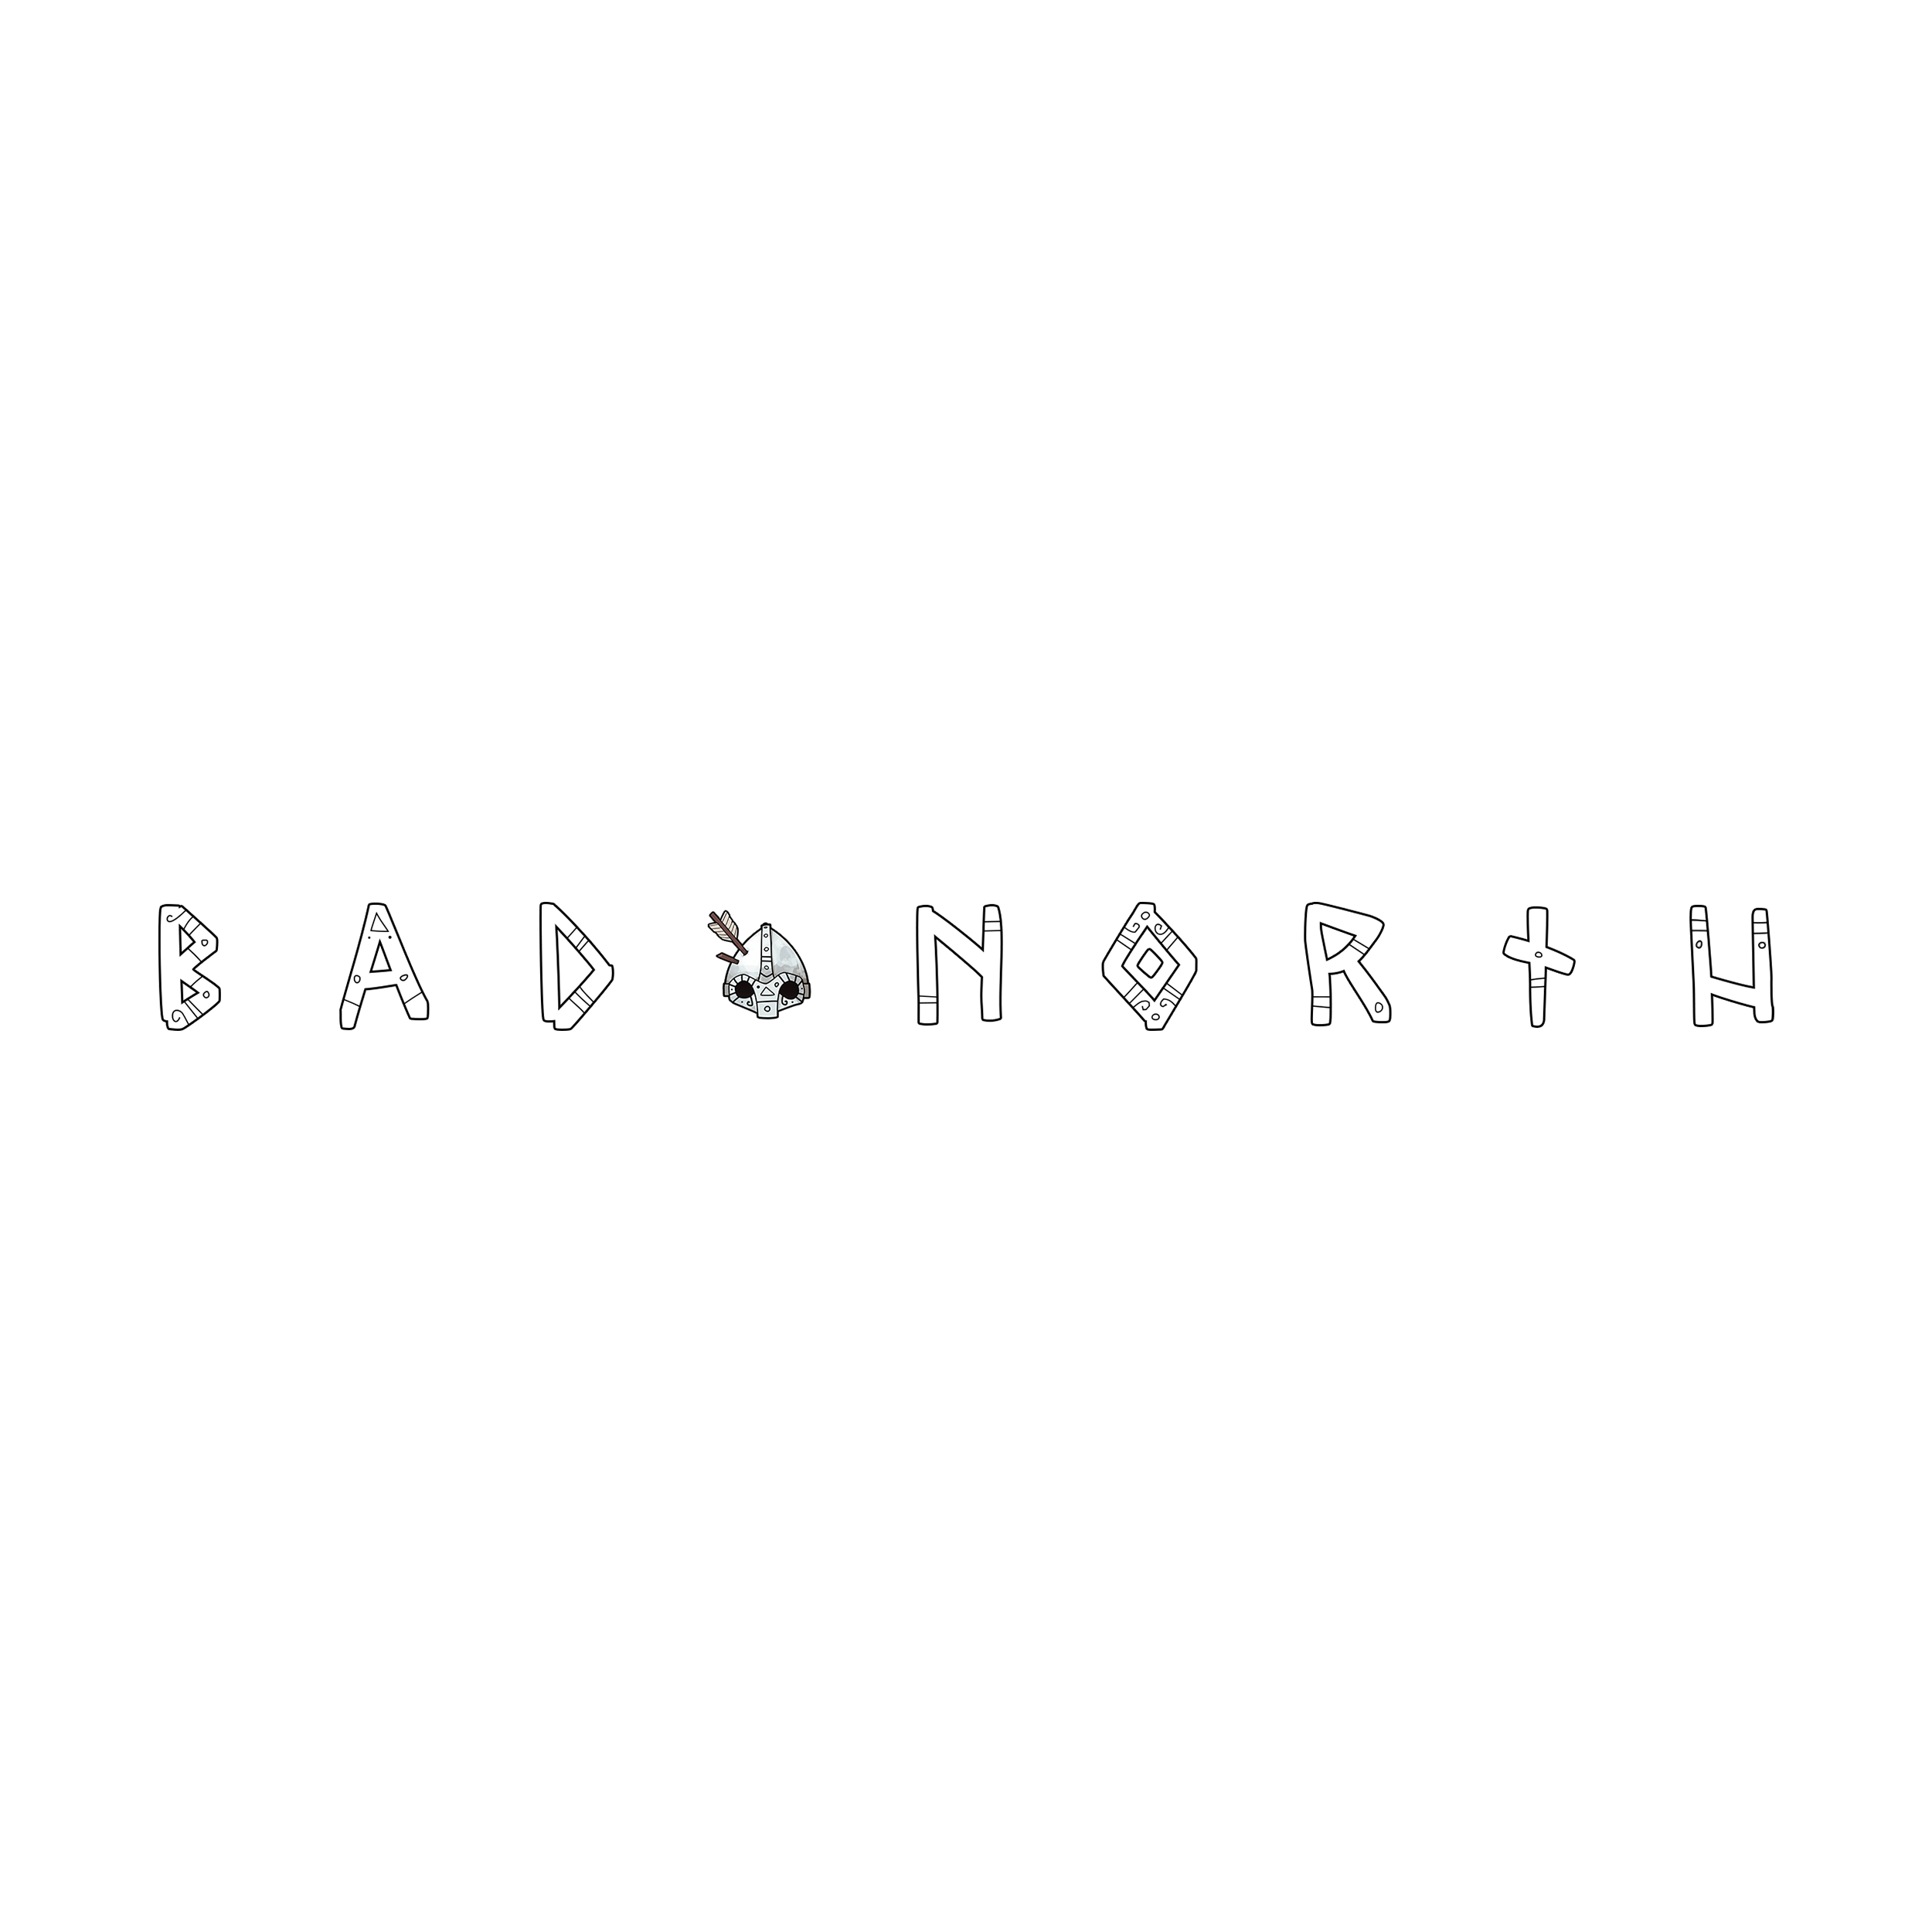 Bad North logo